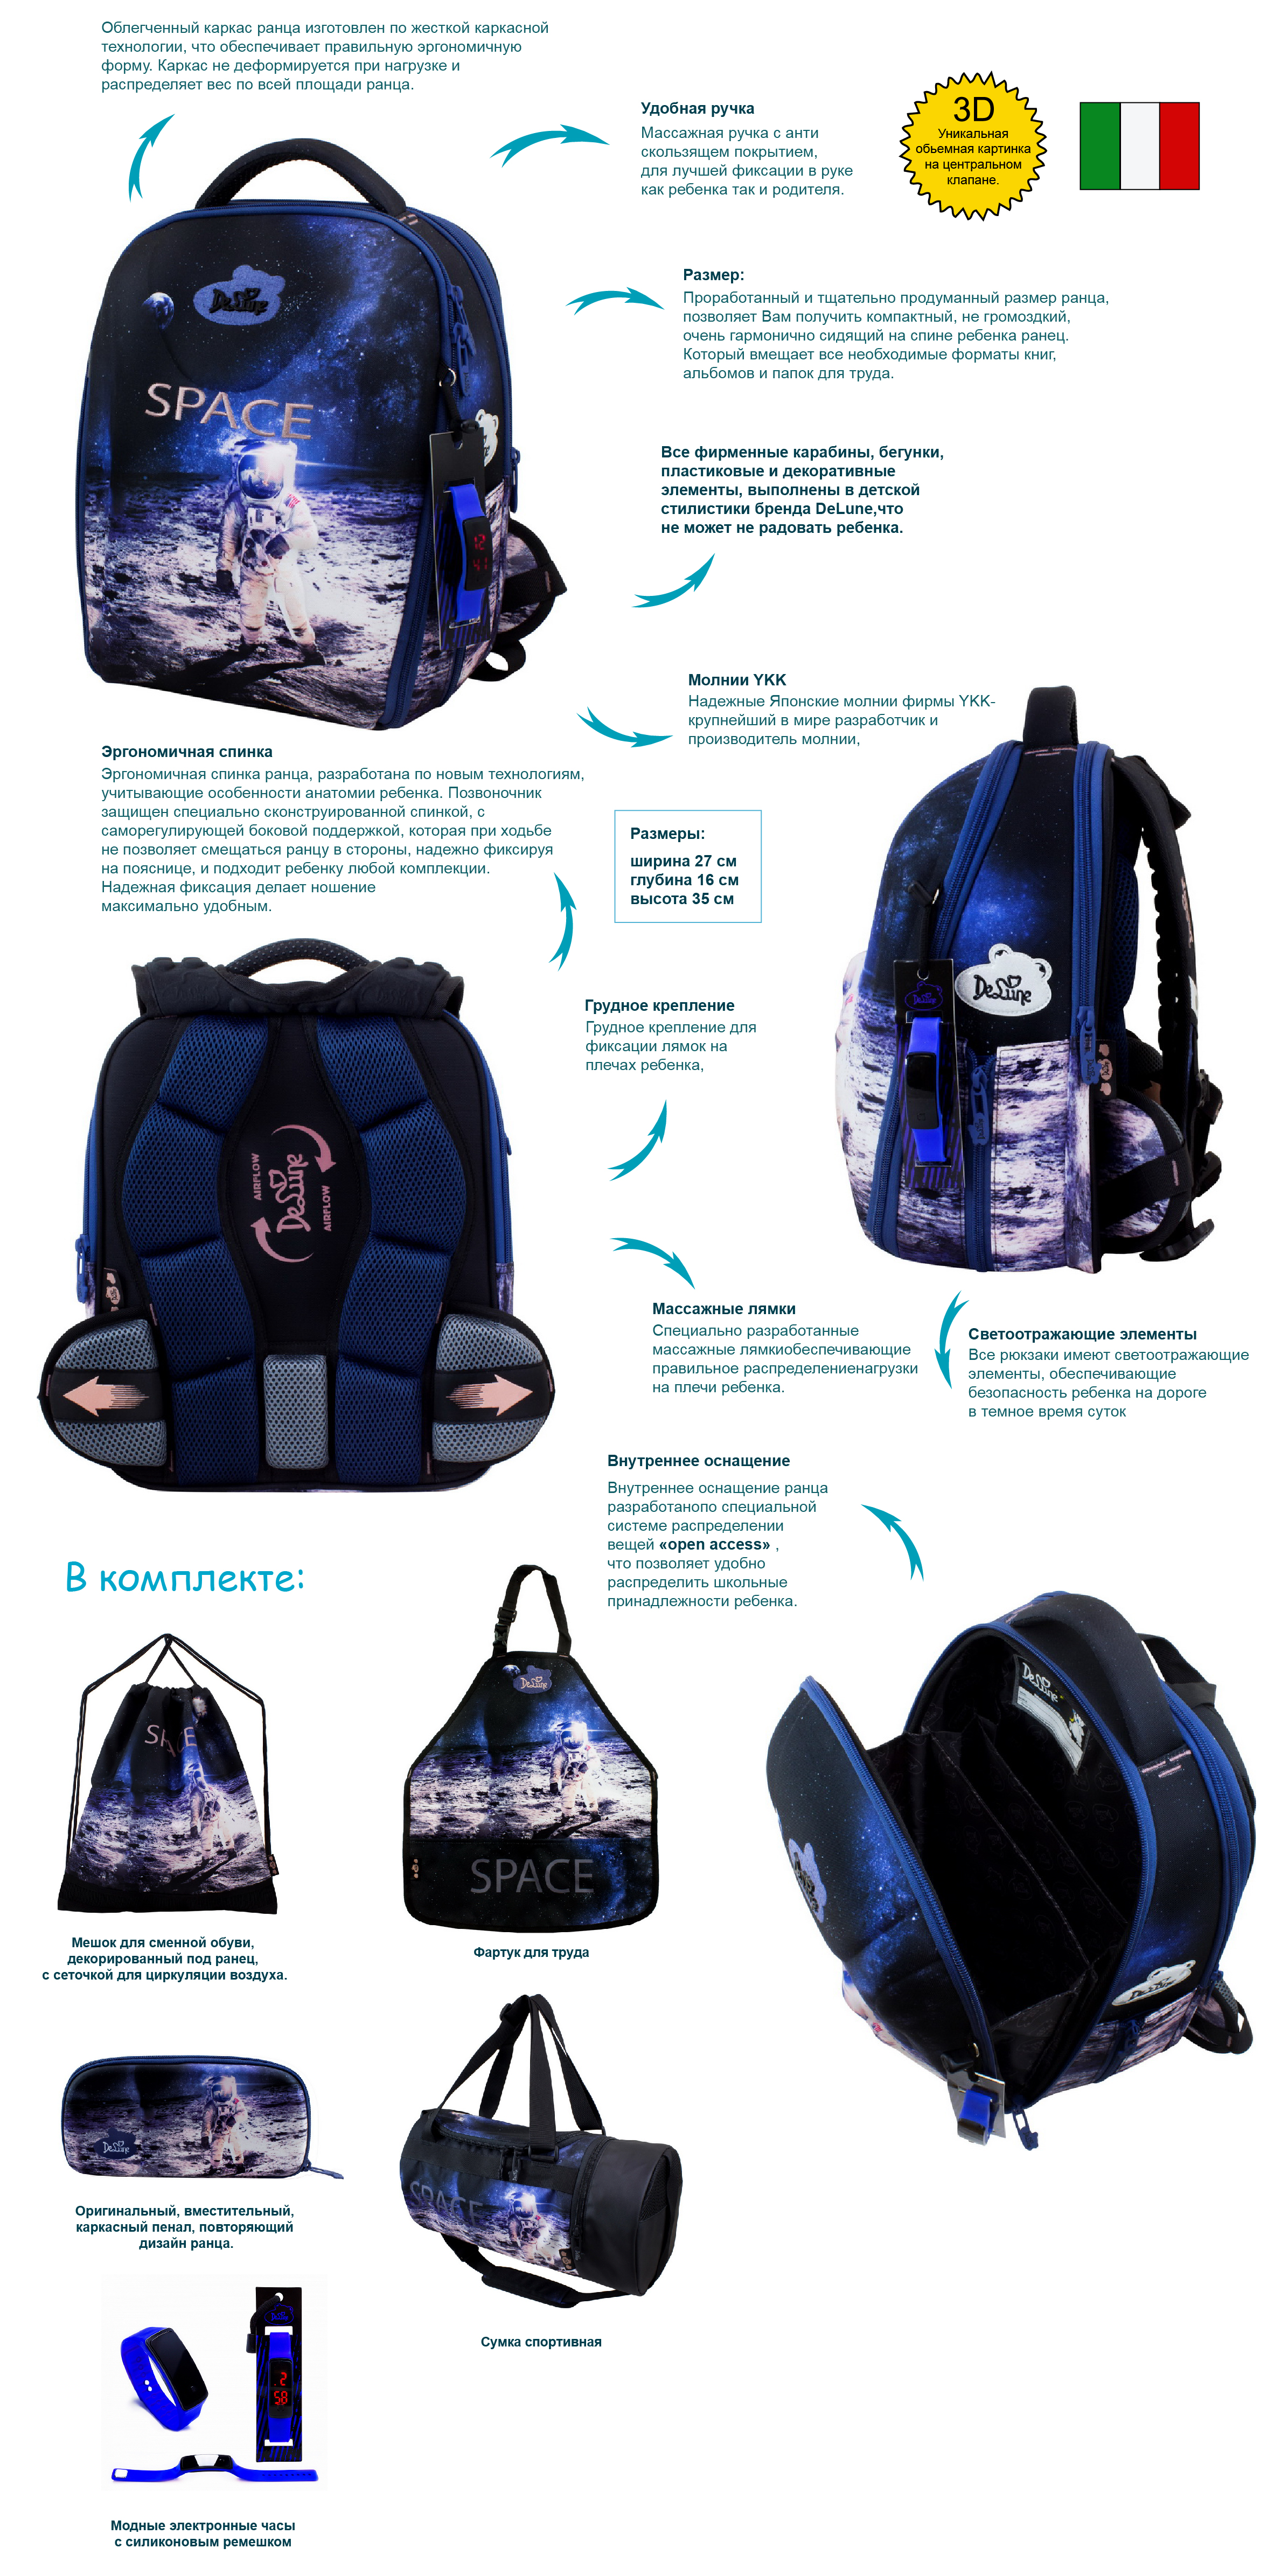 8638a024e394 Ранец DeLune Full-set 7mini-019 + мешок + жесткий пенал + спортивная сумка  + фартук для труда + часы